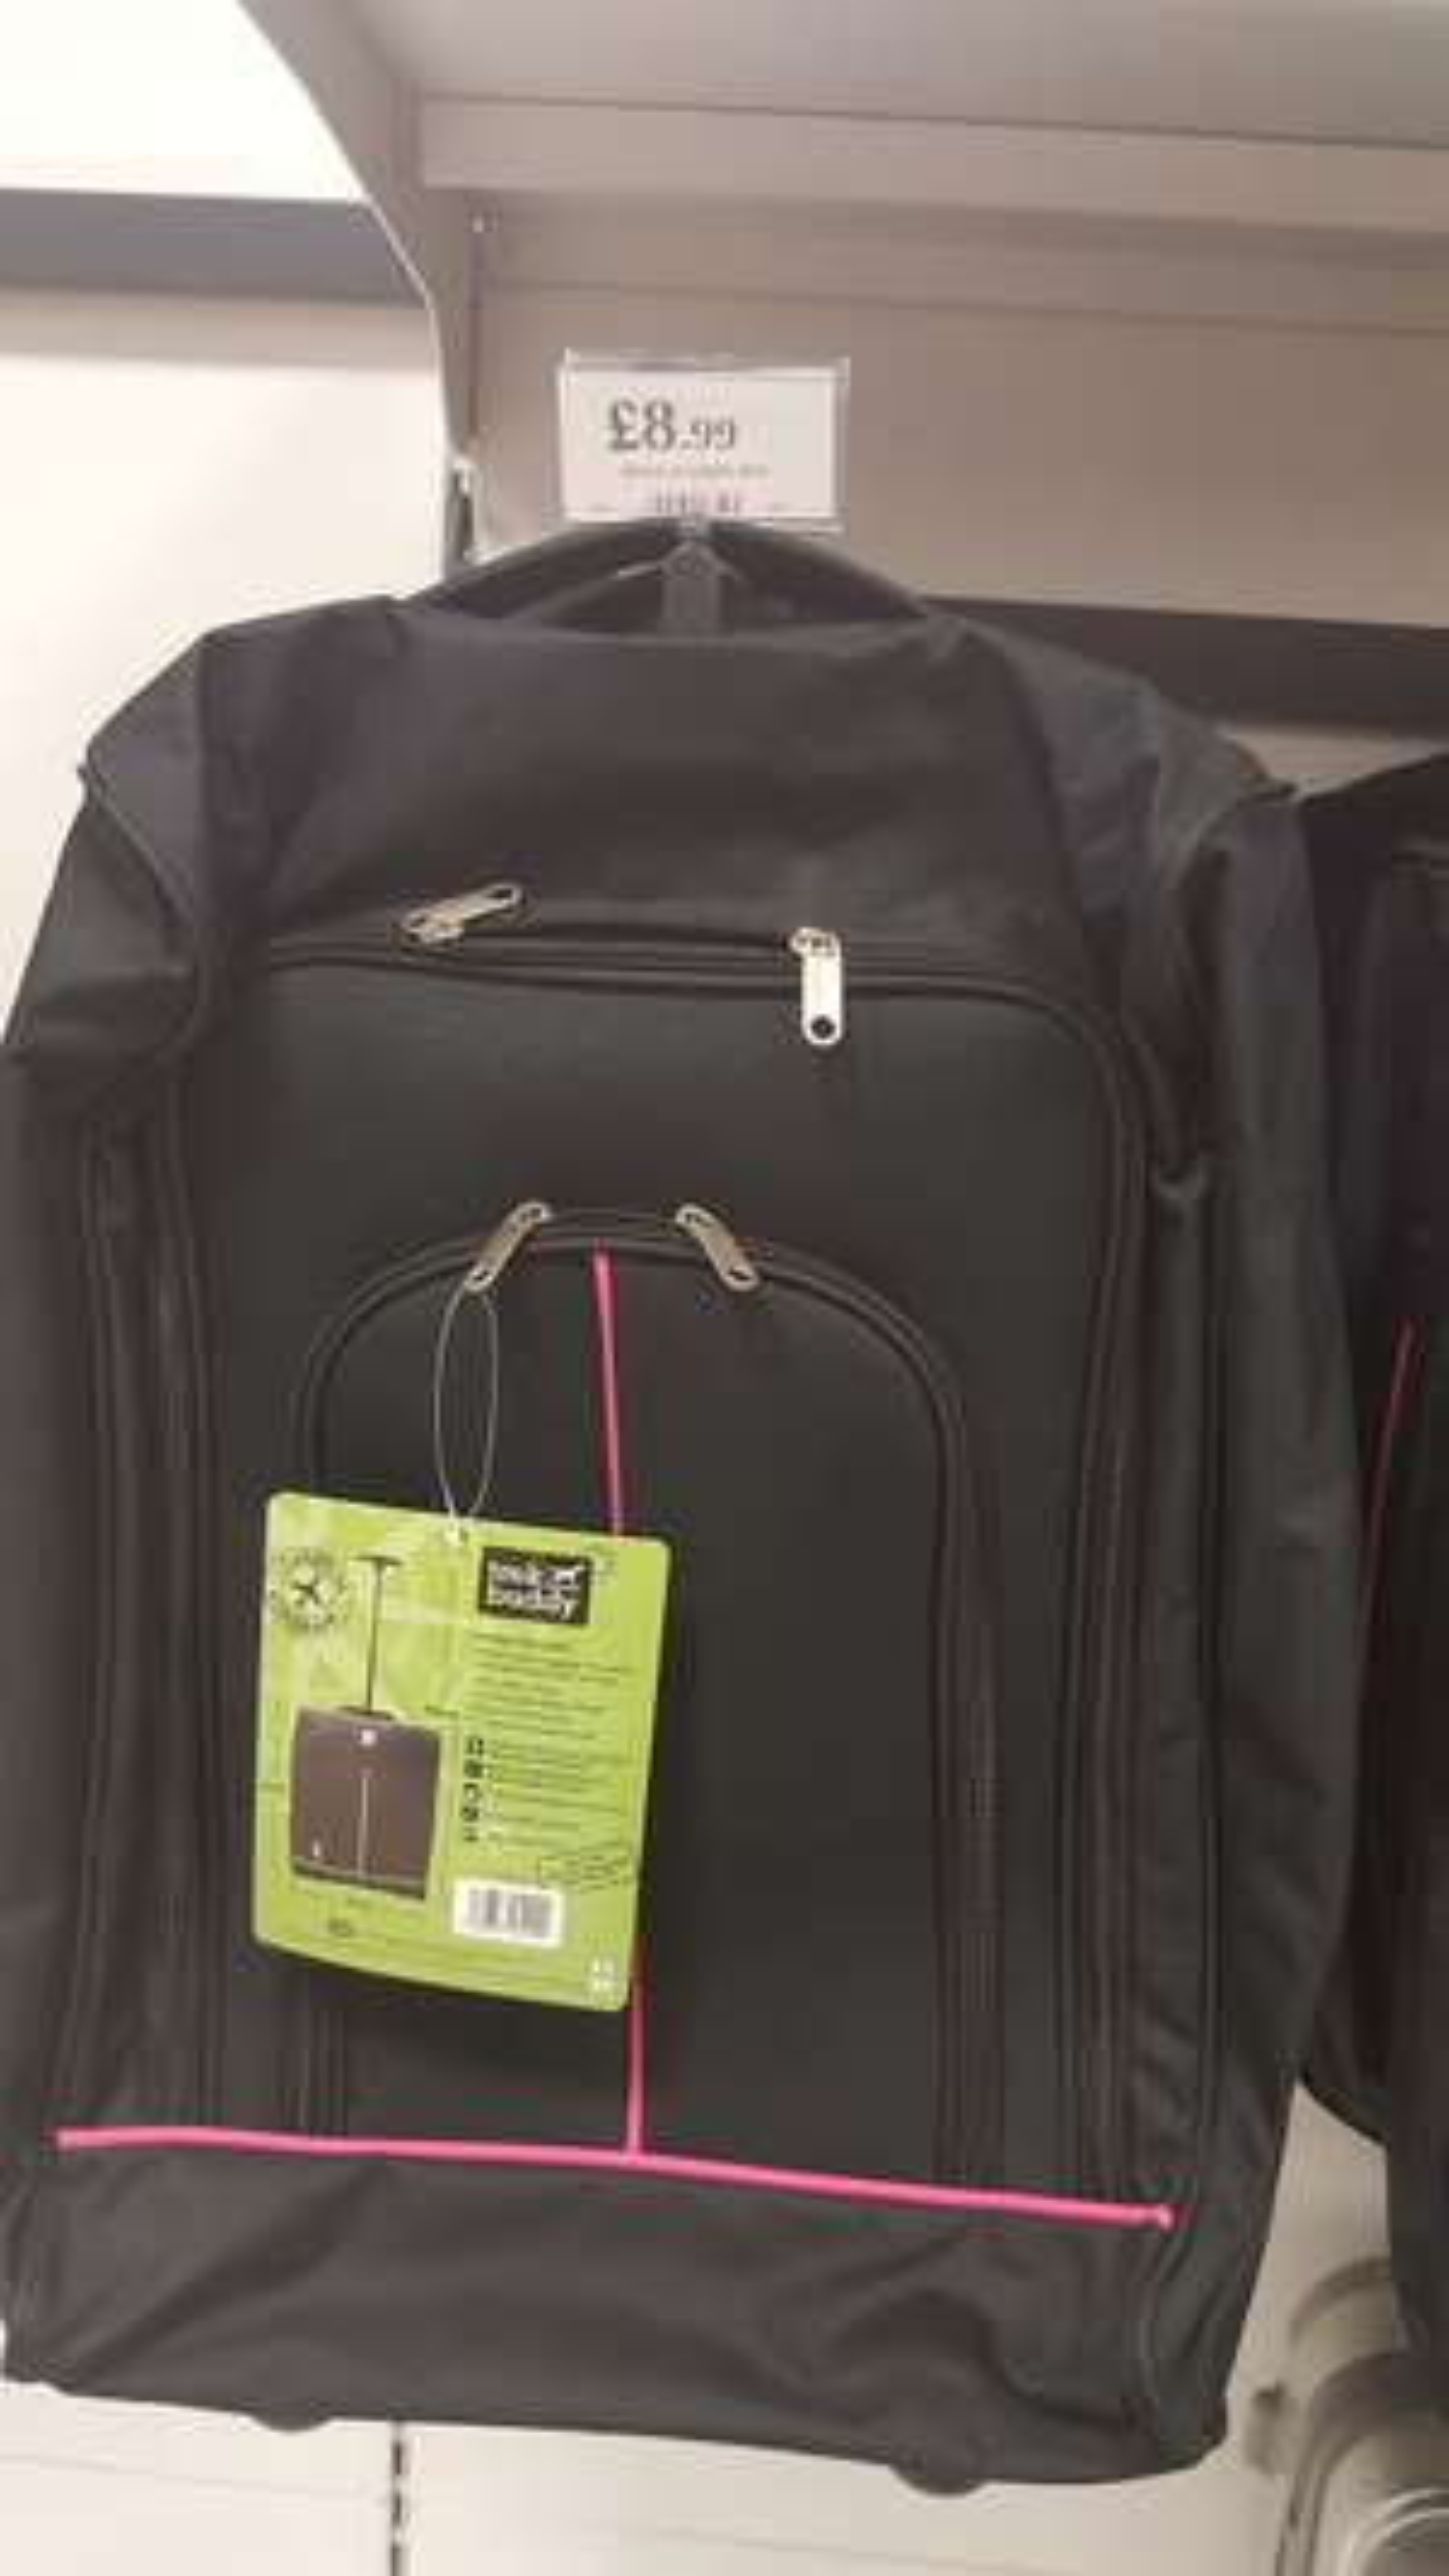 Trek Buddy Cabin Luggage £8.99 @ Home bargains